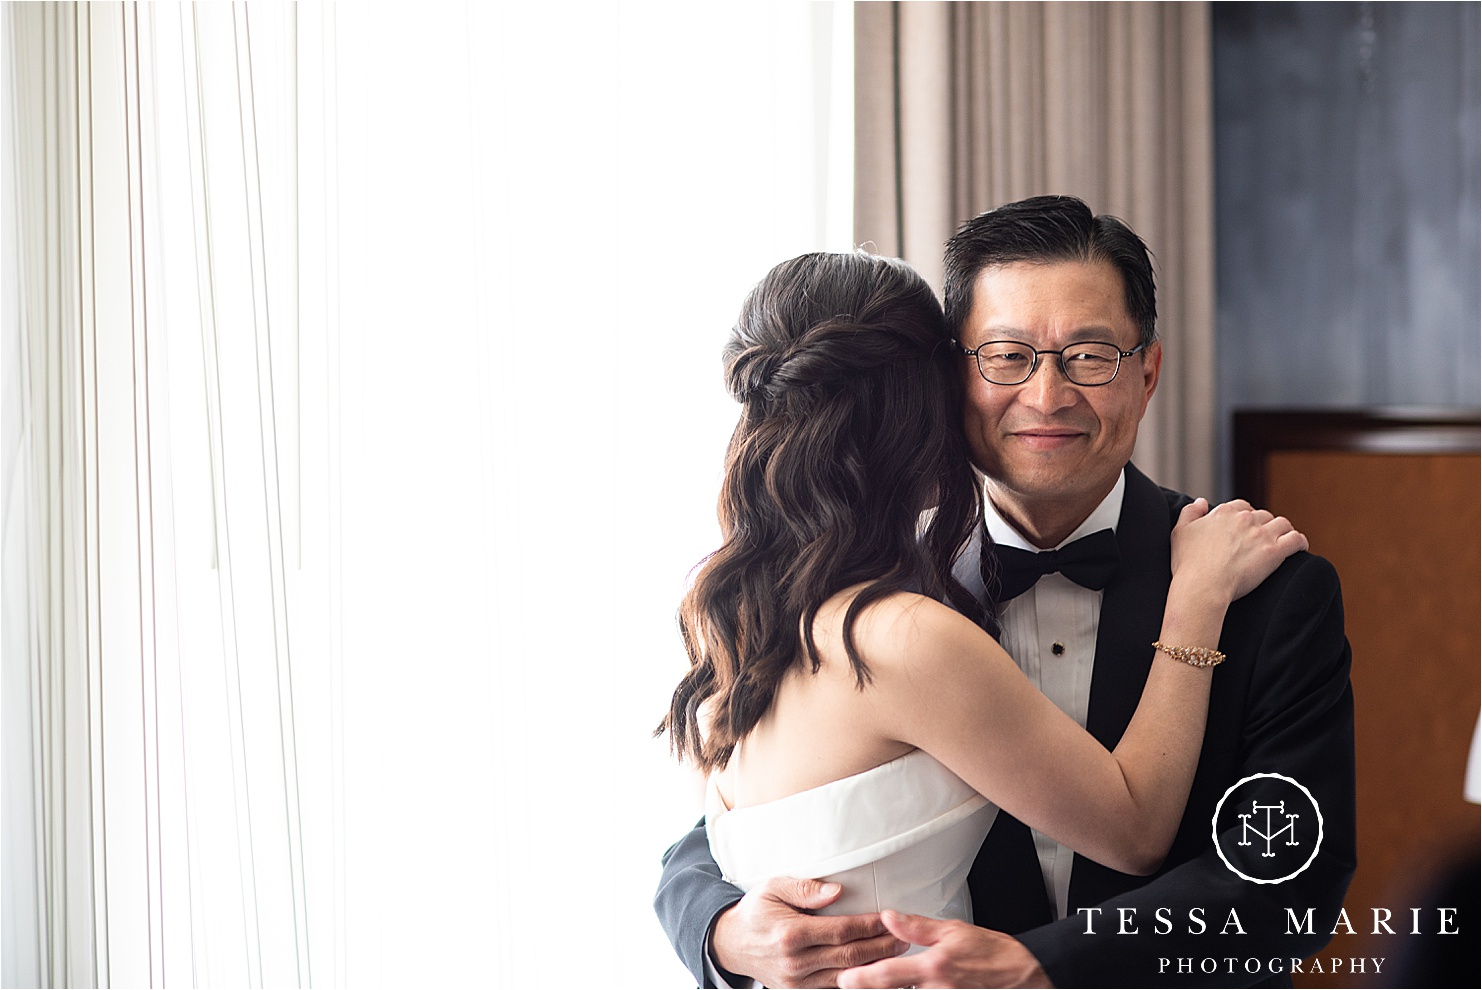 Tessa_marie_weddings_houston_wedding_photographer_The_astorian_0024.jpg